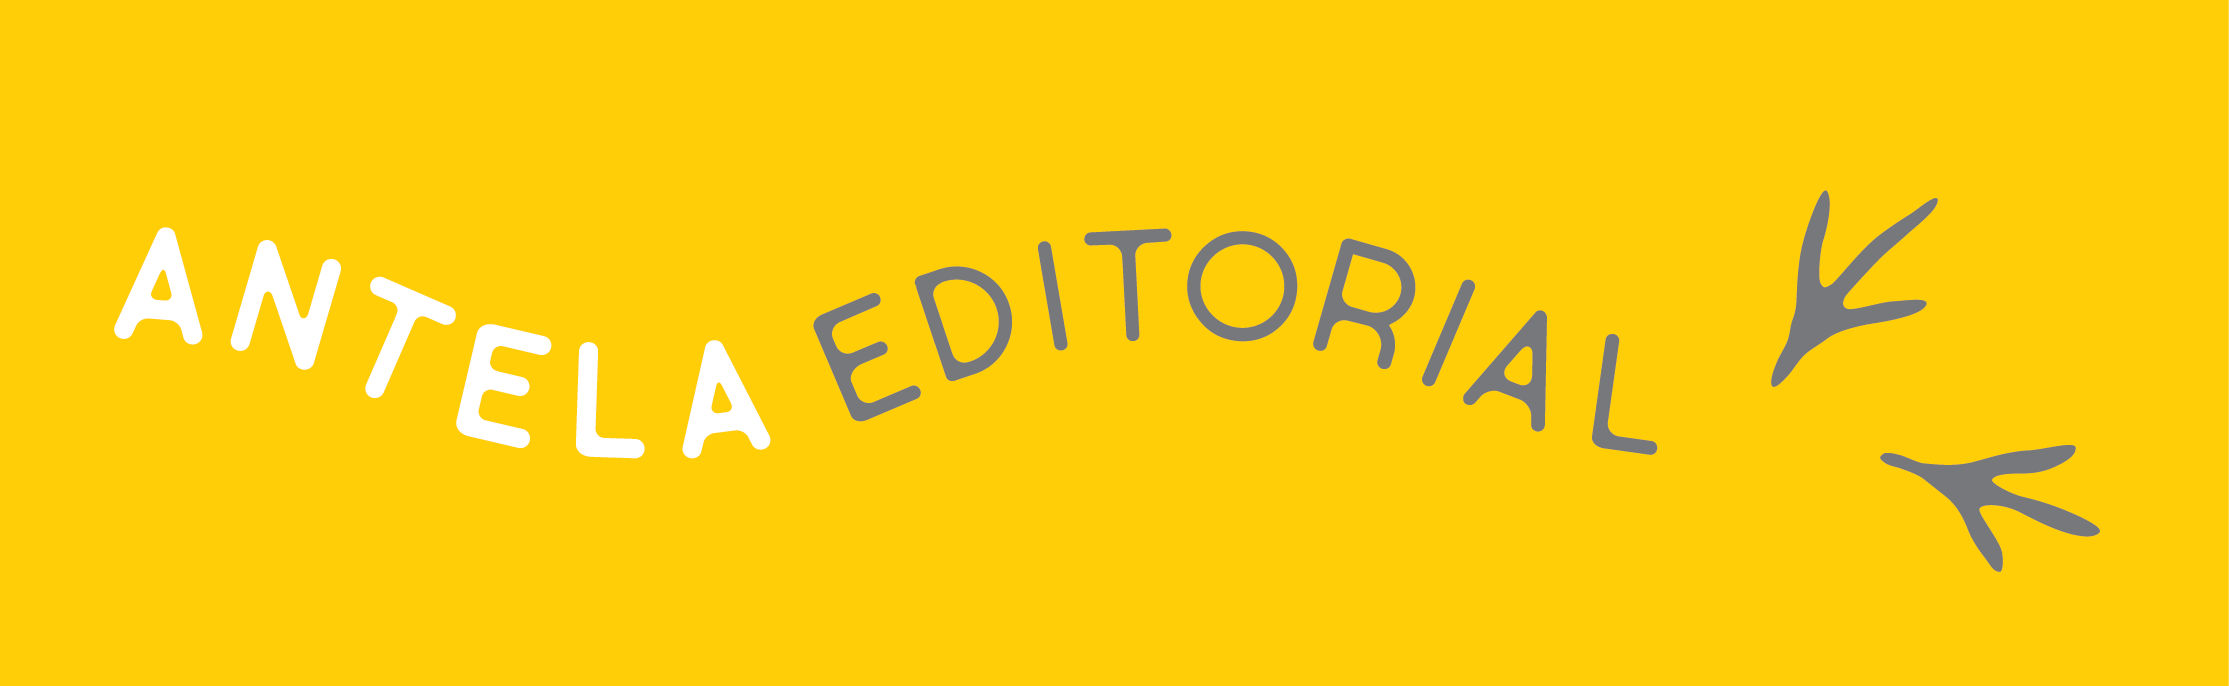 Antela Editorial